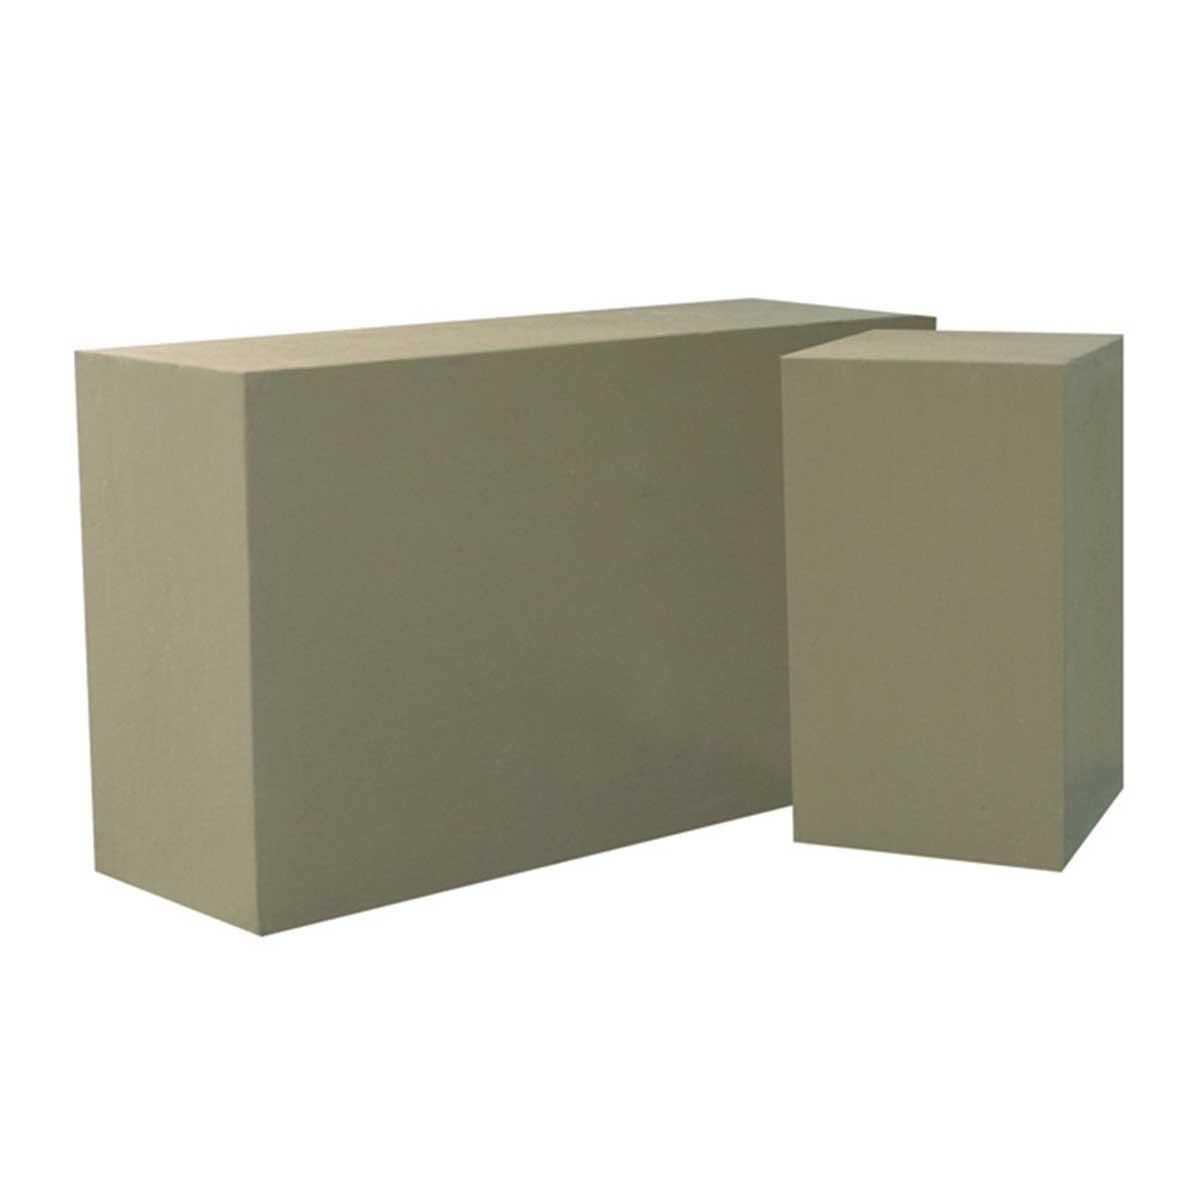 Tile Shower Bench - Wedi Corner Shower Seat, Innovis